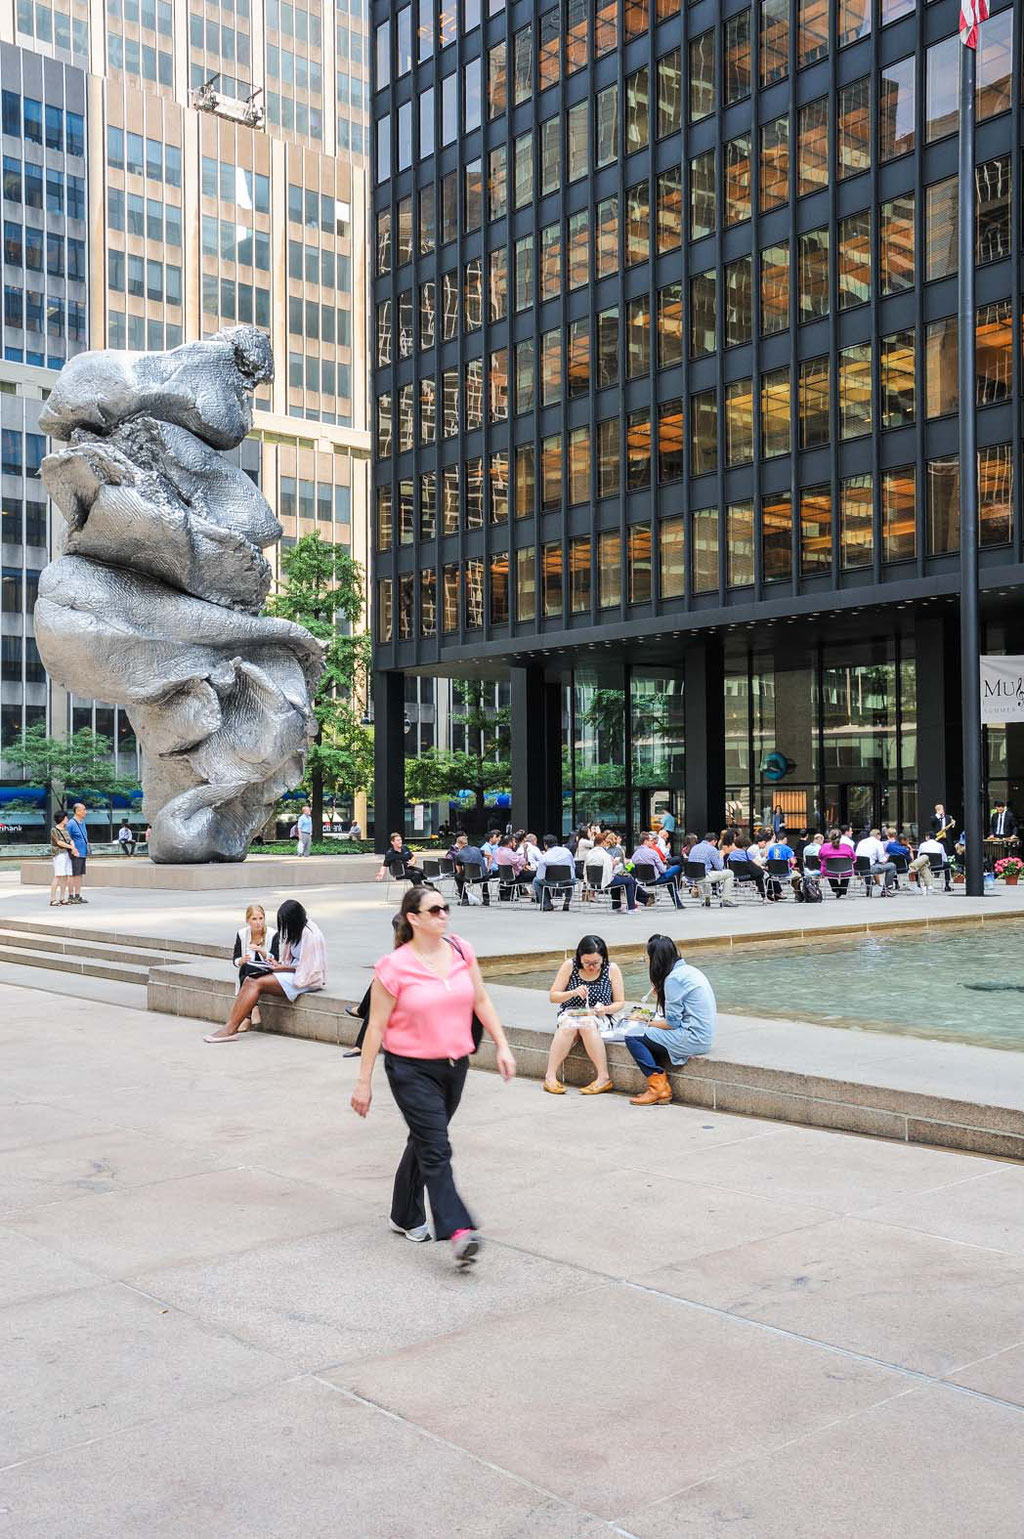 Seagram Building (Ludwig Mies van der Rohe, Philip Johnson), New York City (USA)